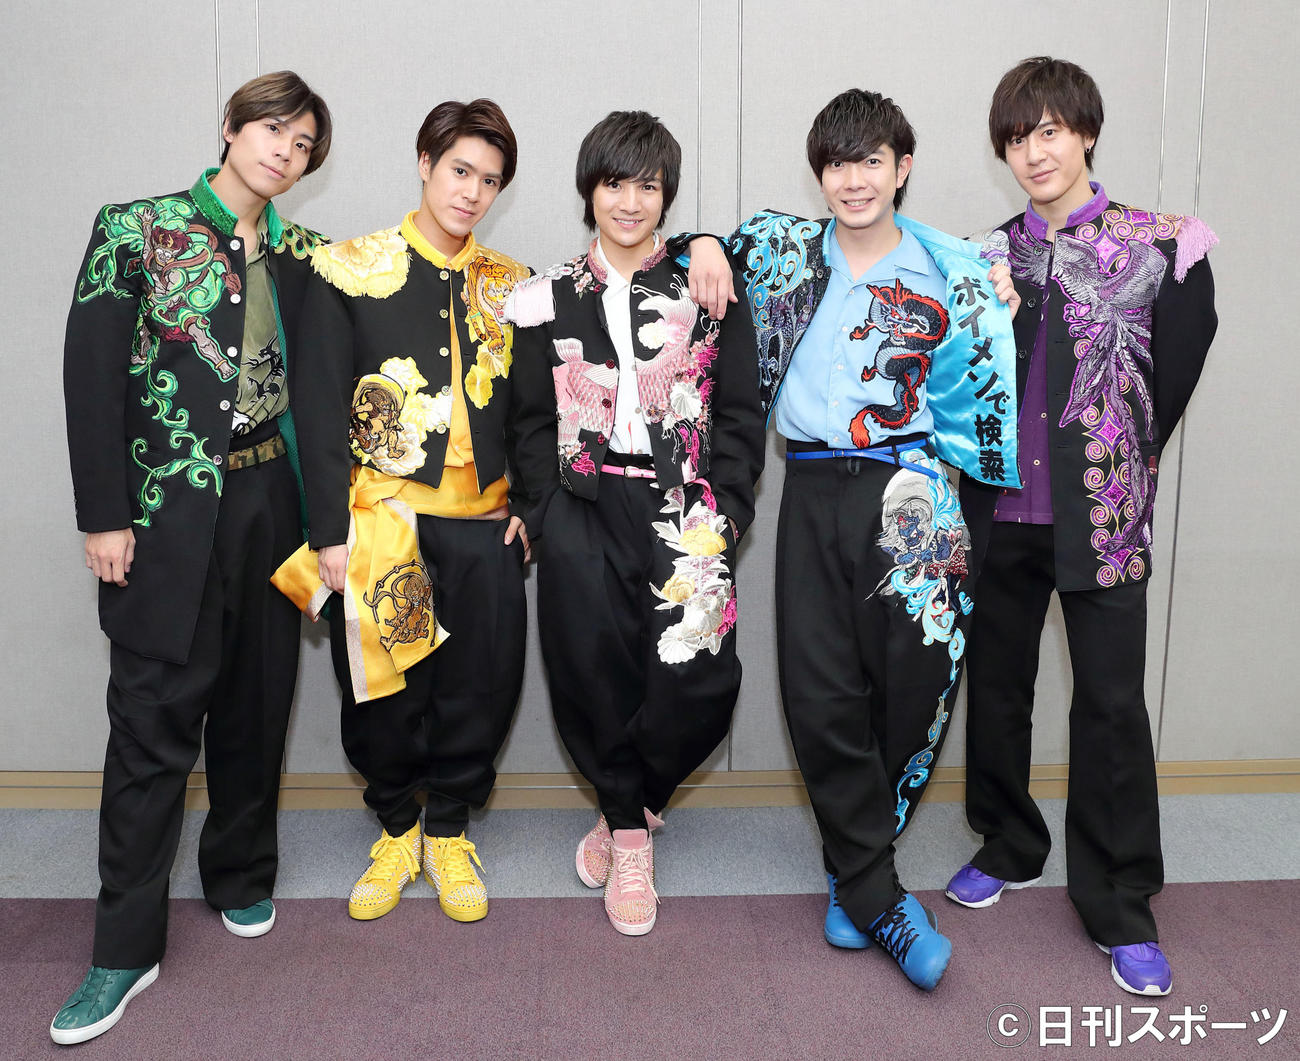 BOYS AND MENのメンバーたち。左から吉原雅斗、平松賢人、本田剛文、田村侑久、土田拓海(2020年3月10日撮影)